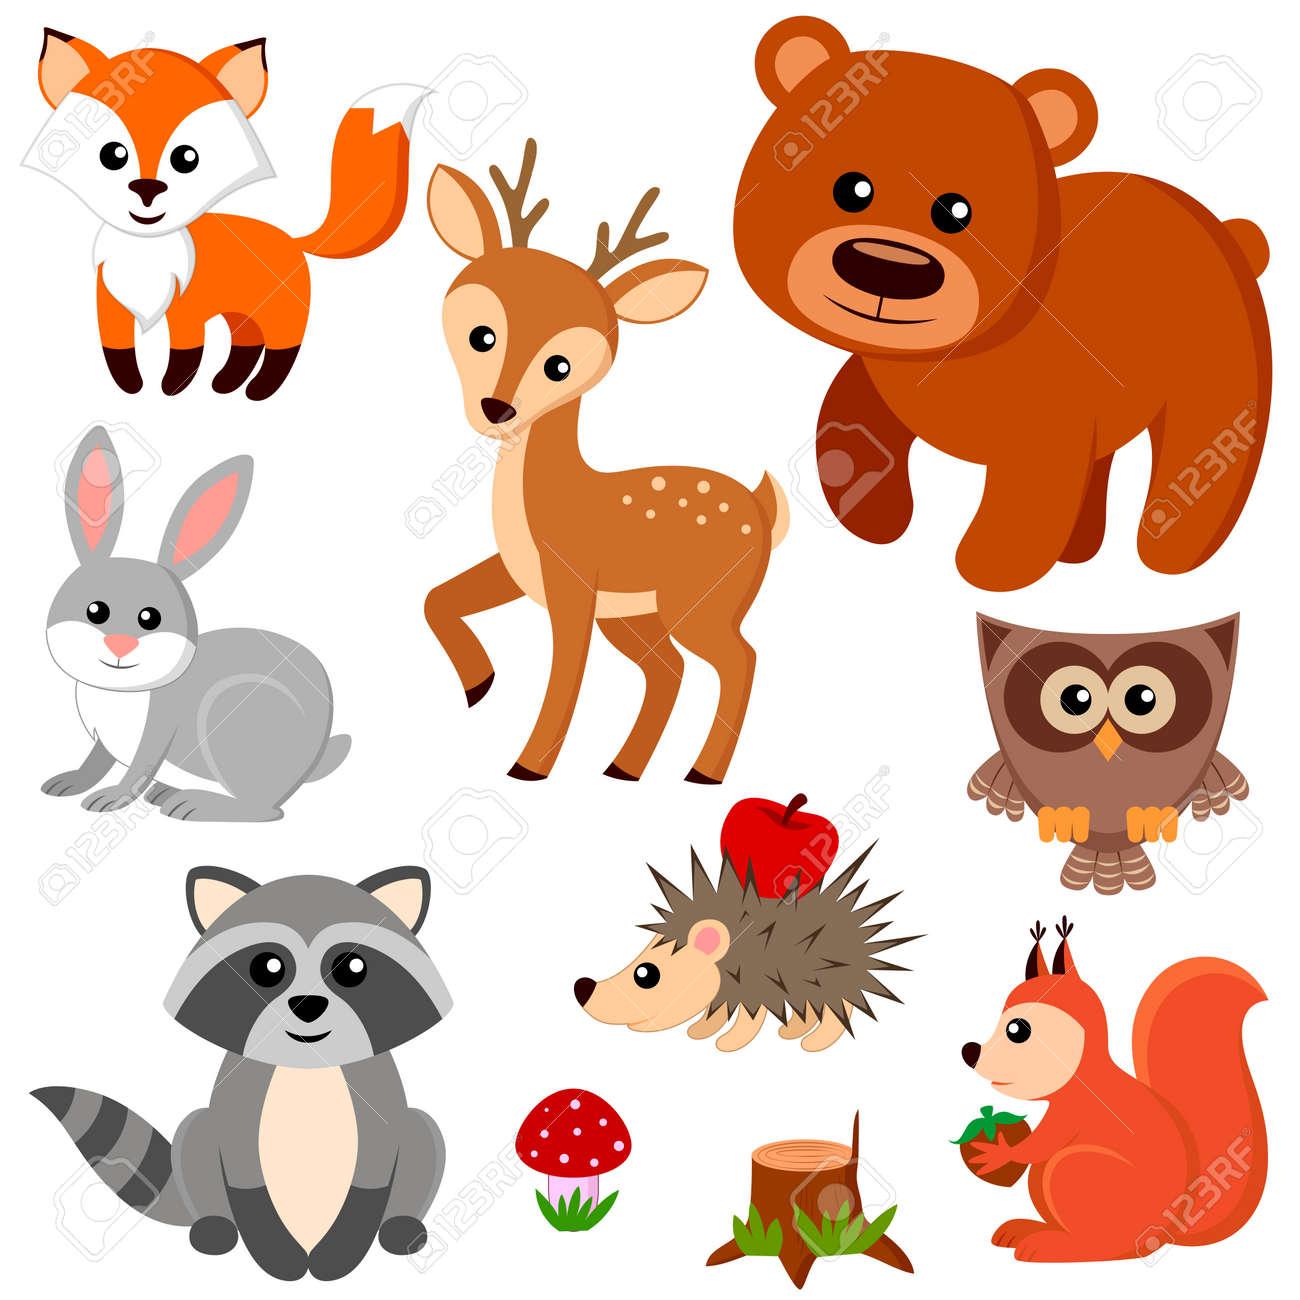 hight resolution of forest animals illustration